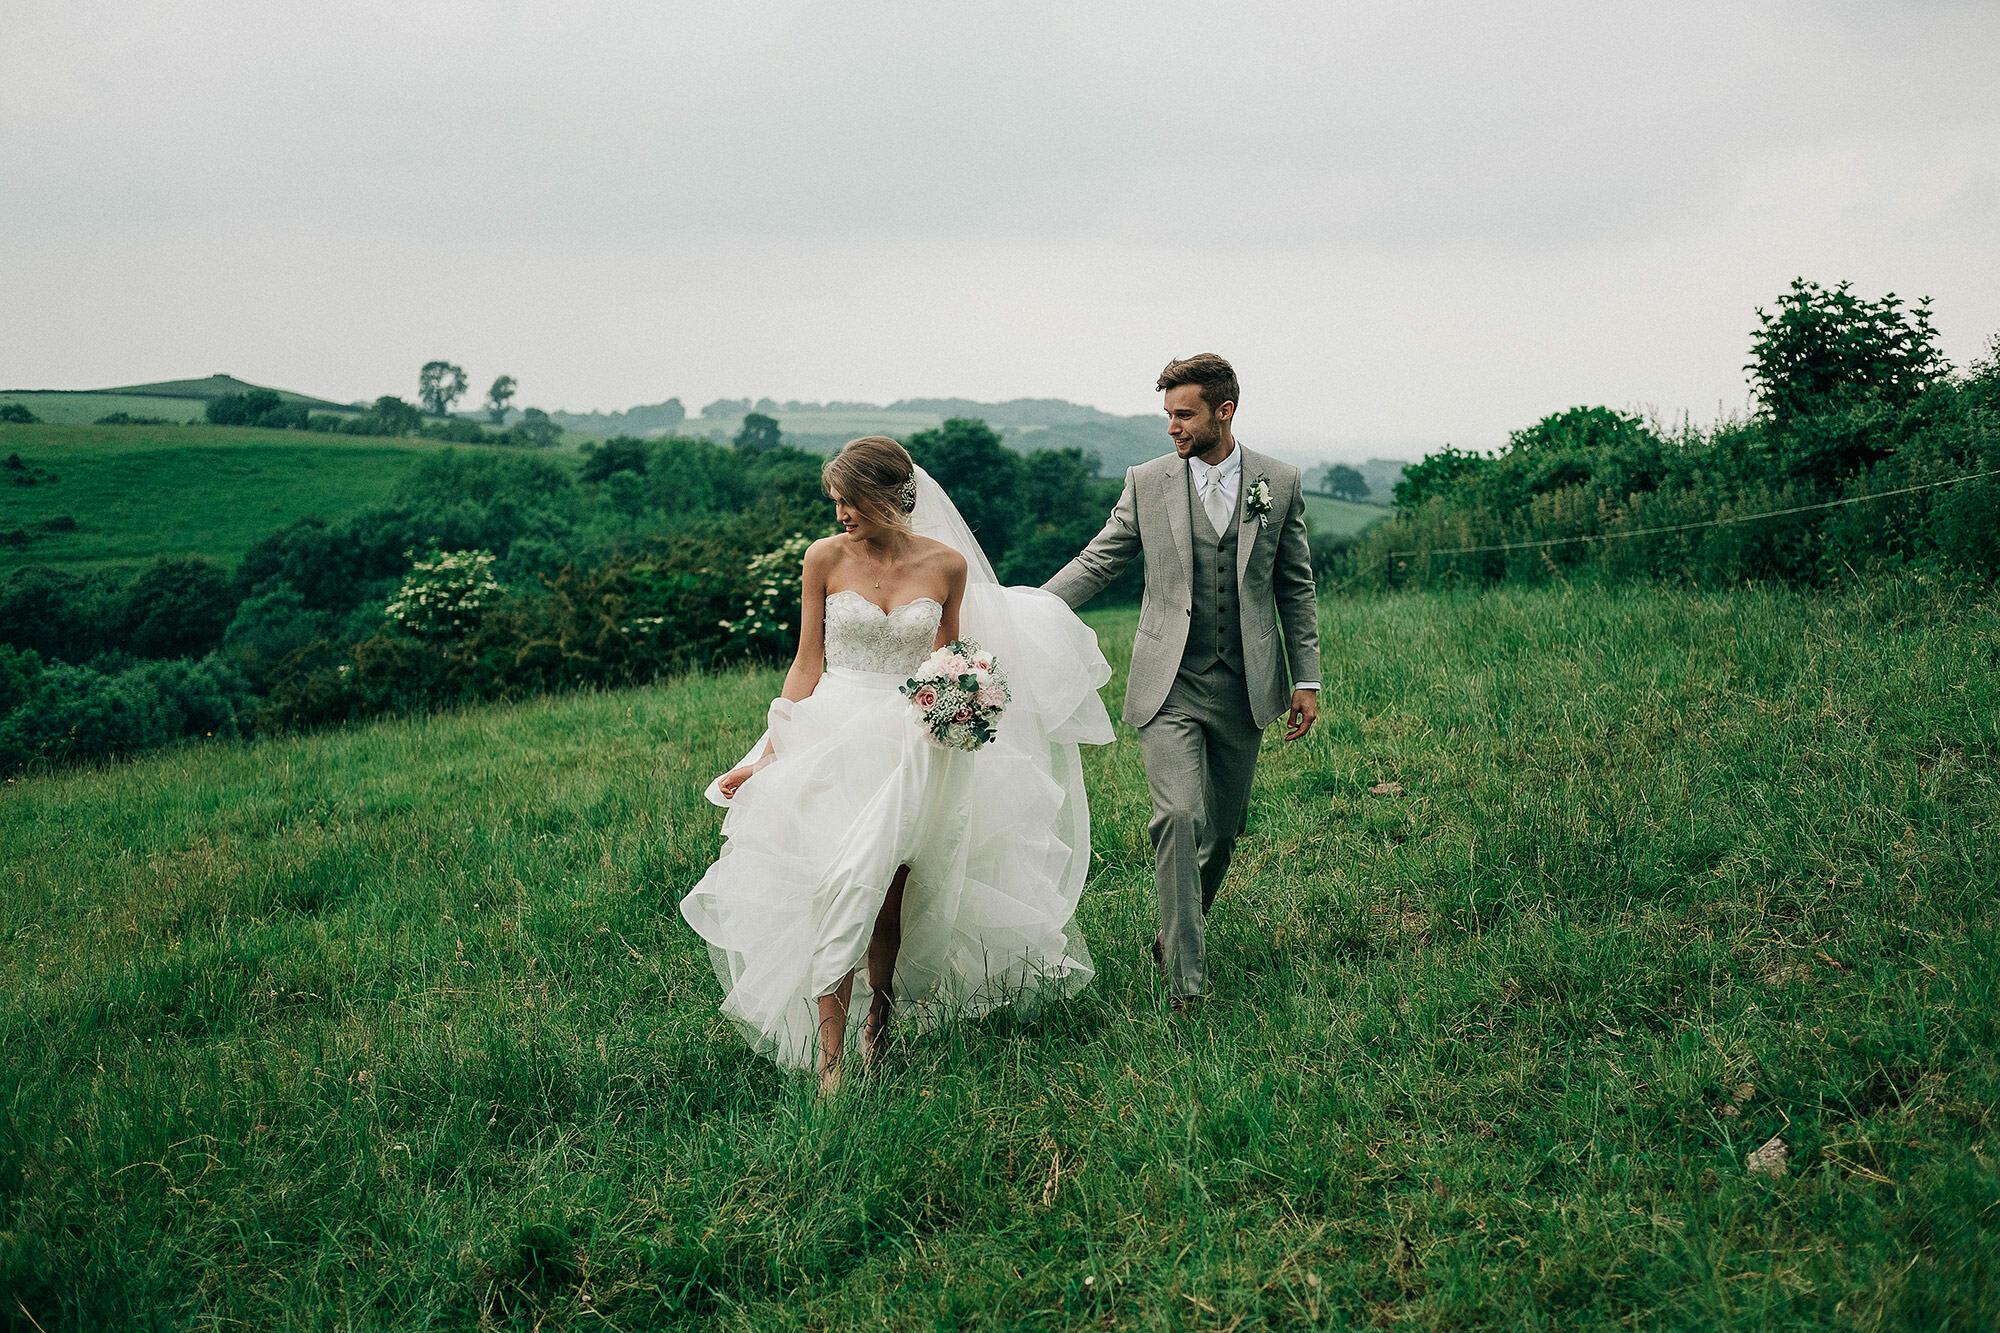 taisy-matthew-wed-2016-0387